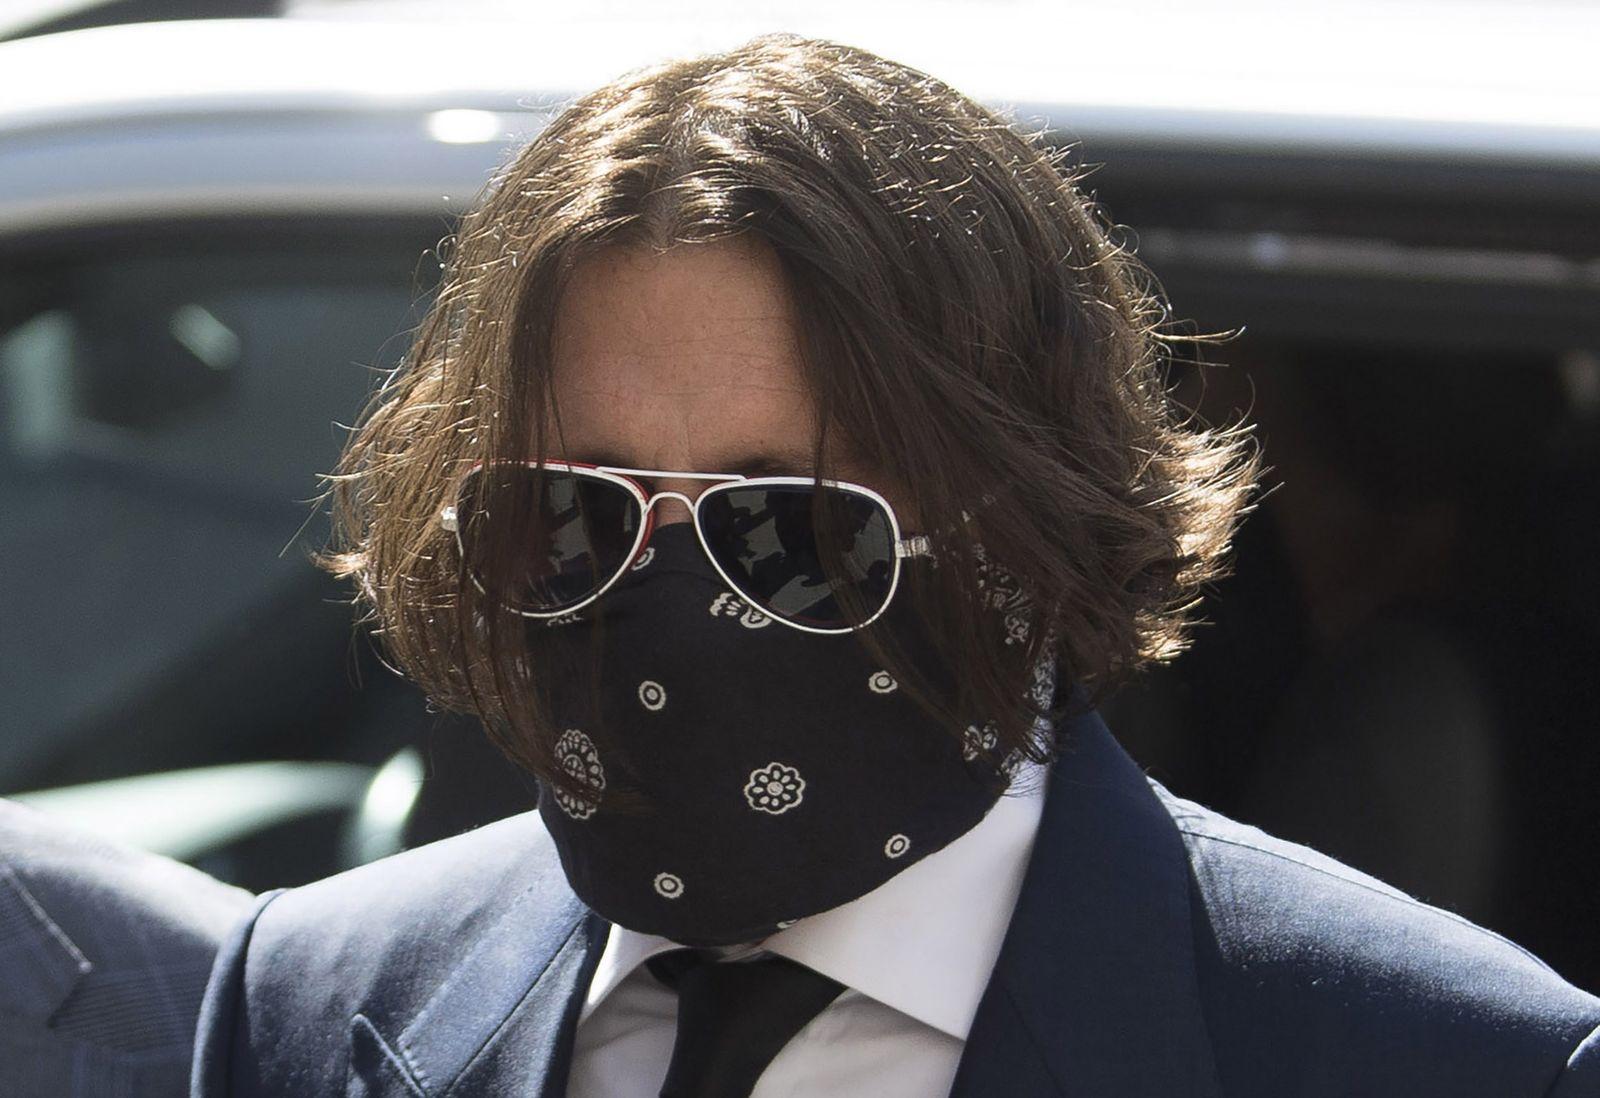 Johnn Depp Trial, London, United Kingdom - 07 Jul 2020